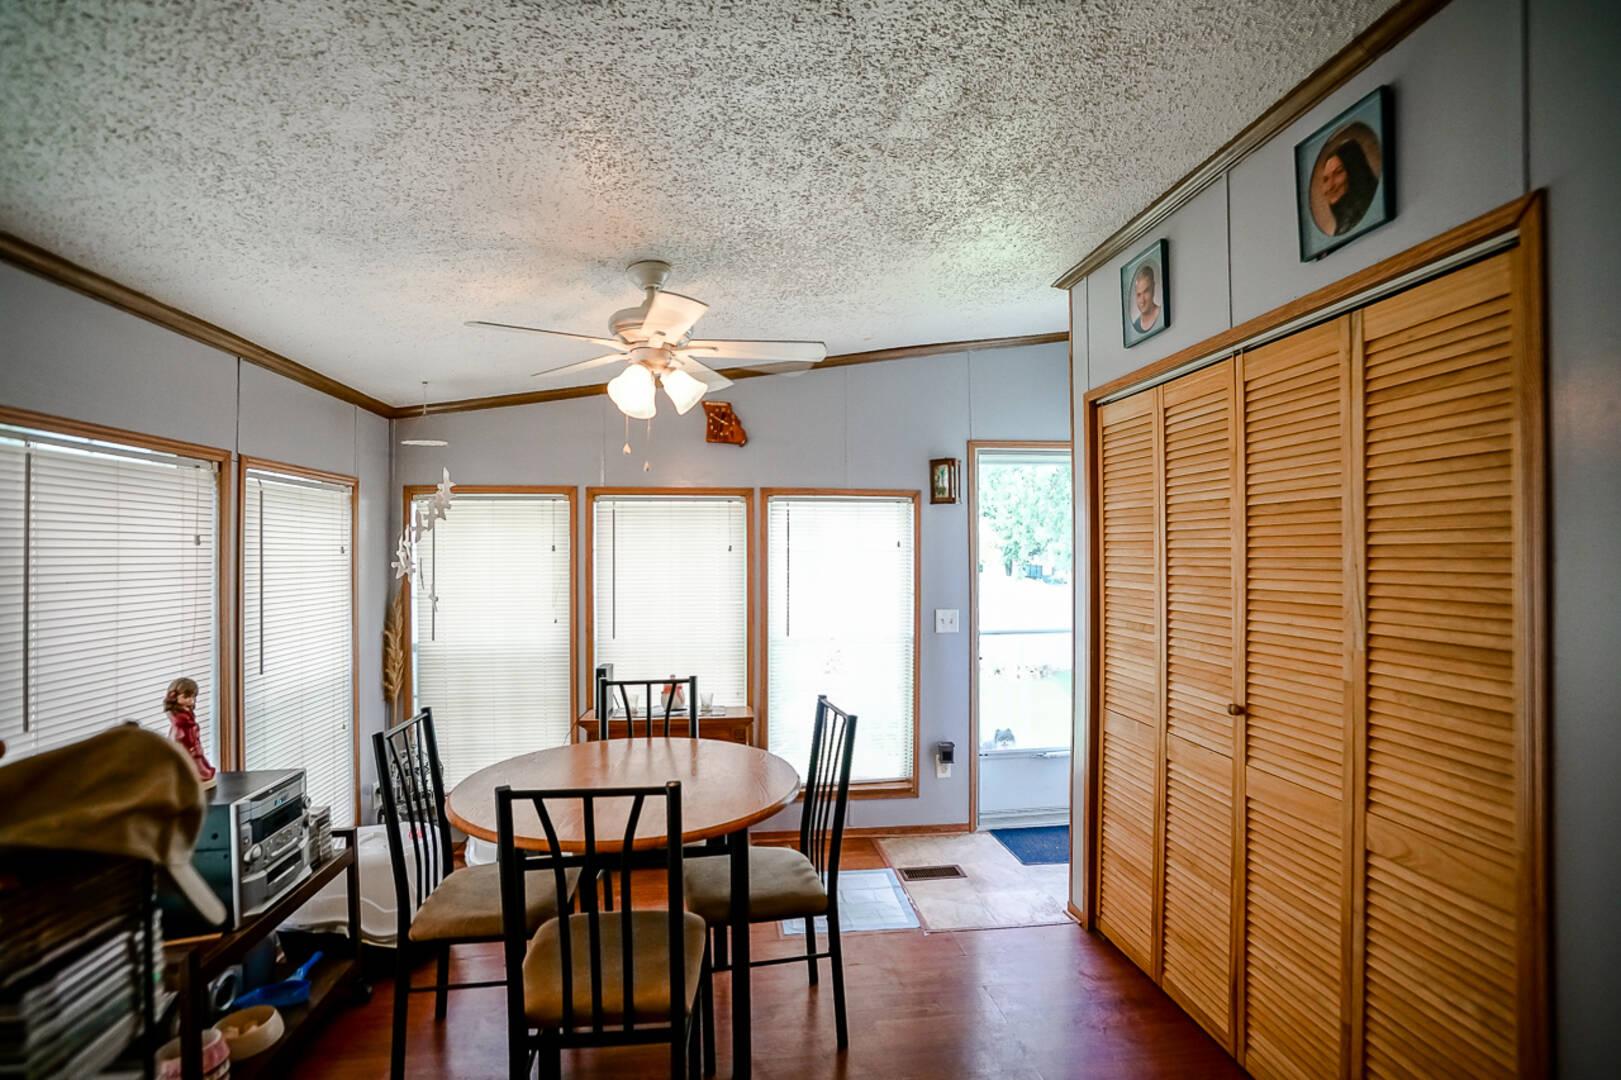 78 Pinewood Estates Chillicothe, IL 61523